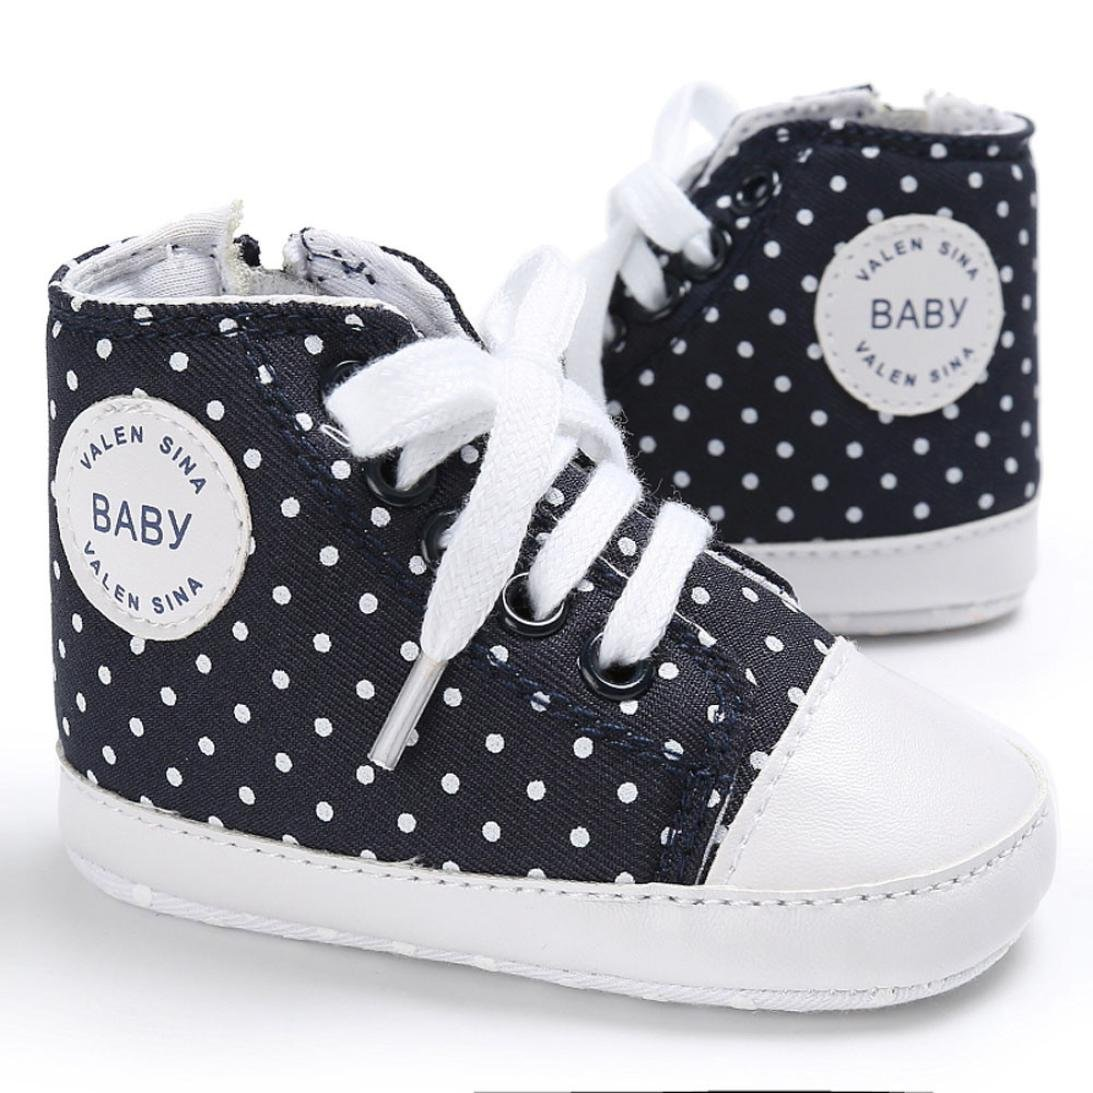 Fabal Baby Shoes Boy Girl Newborn Crib Soft Sole Shoe Sneakers